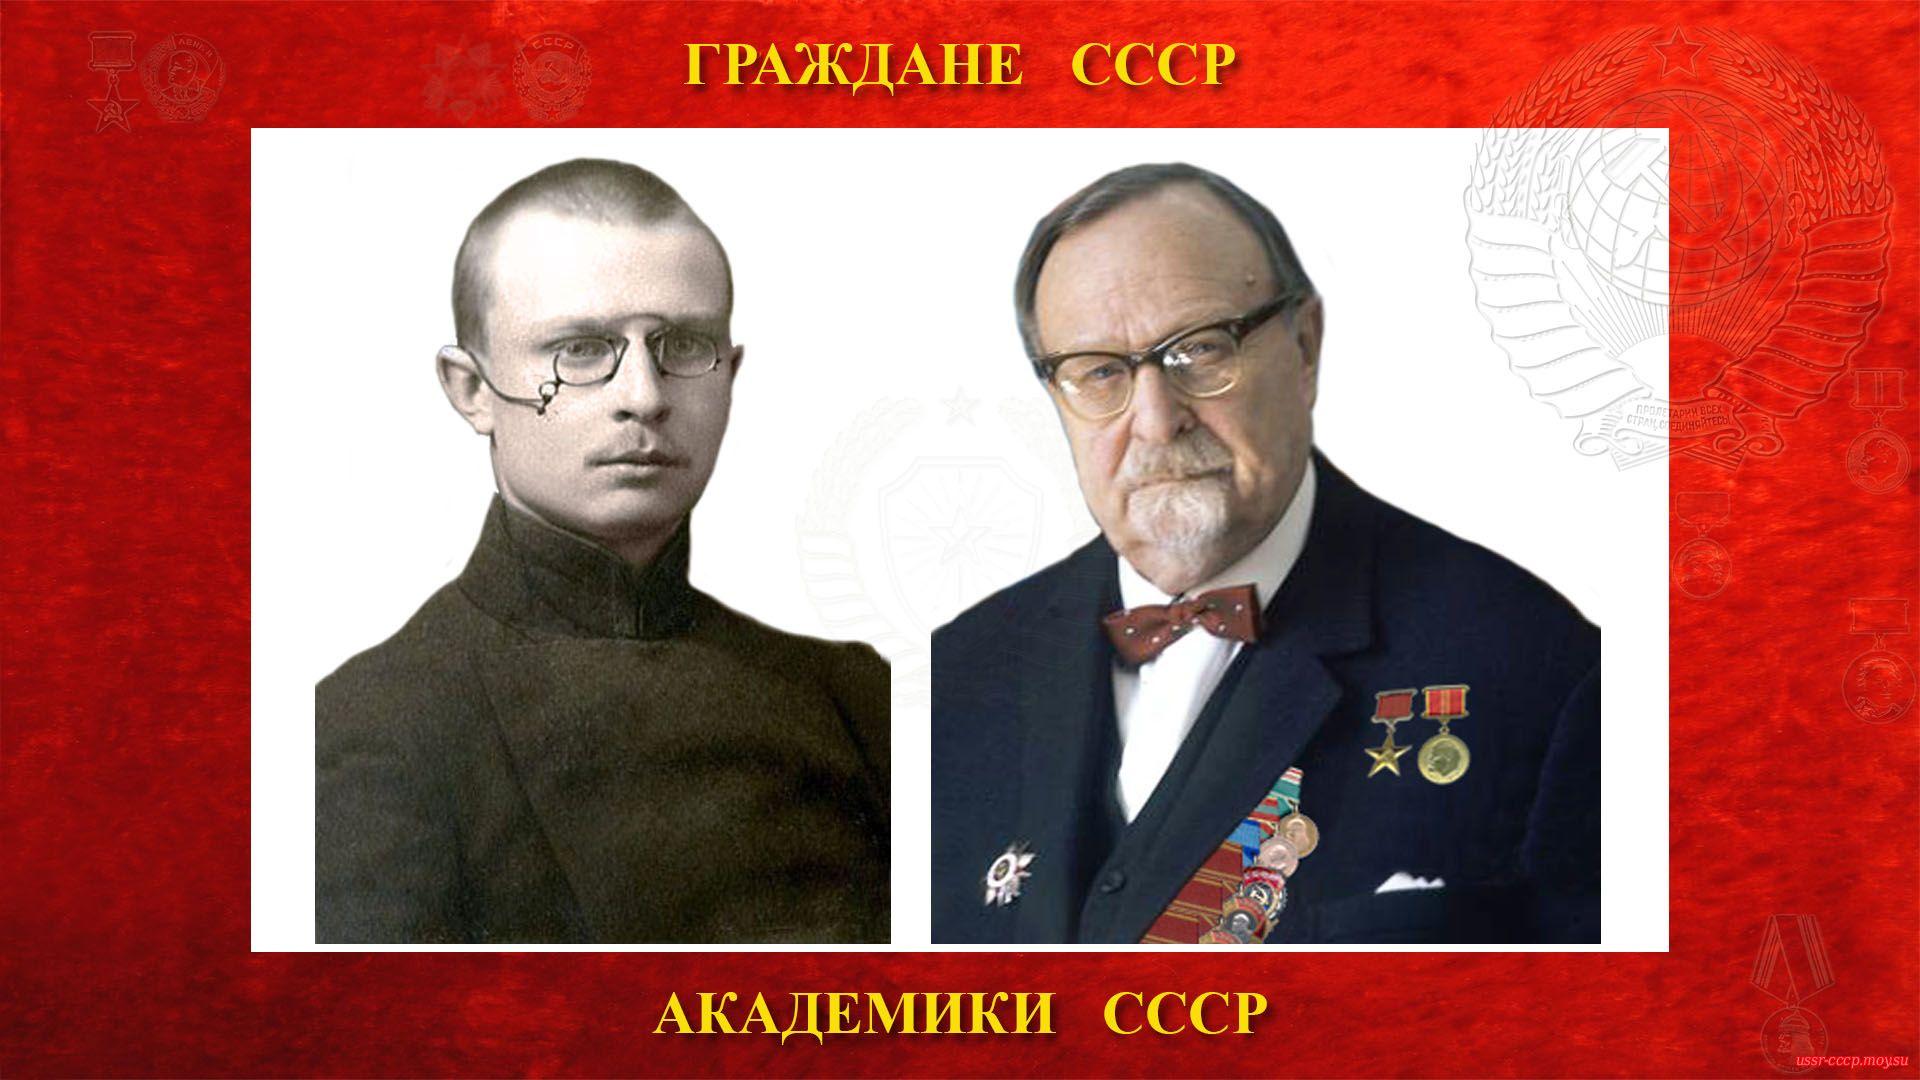 Опарин Александр Иванович — Академик АН СССР — Советскийбиологибиохимик (02.03.1894 — 21.04.1980)